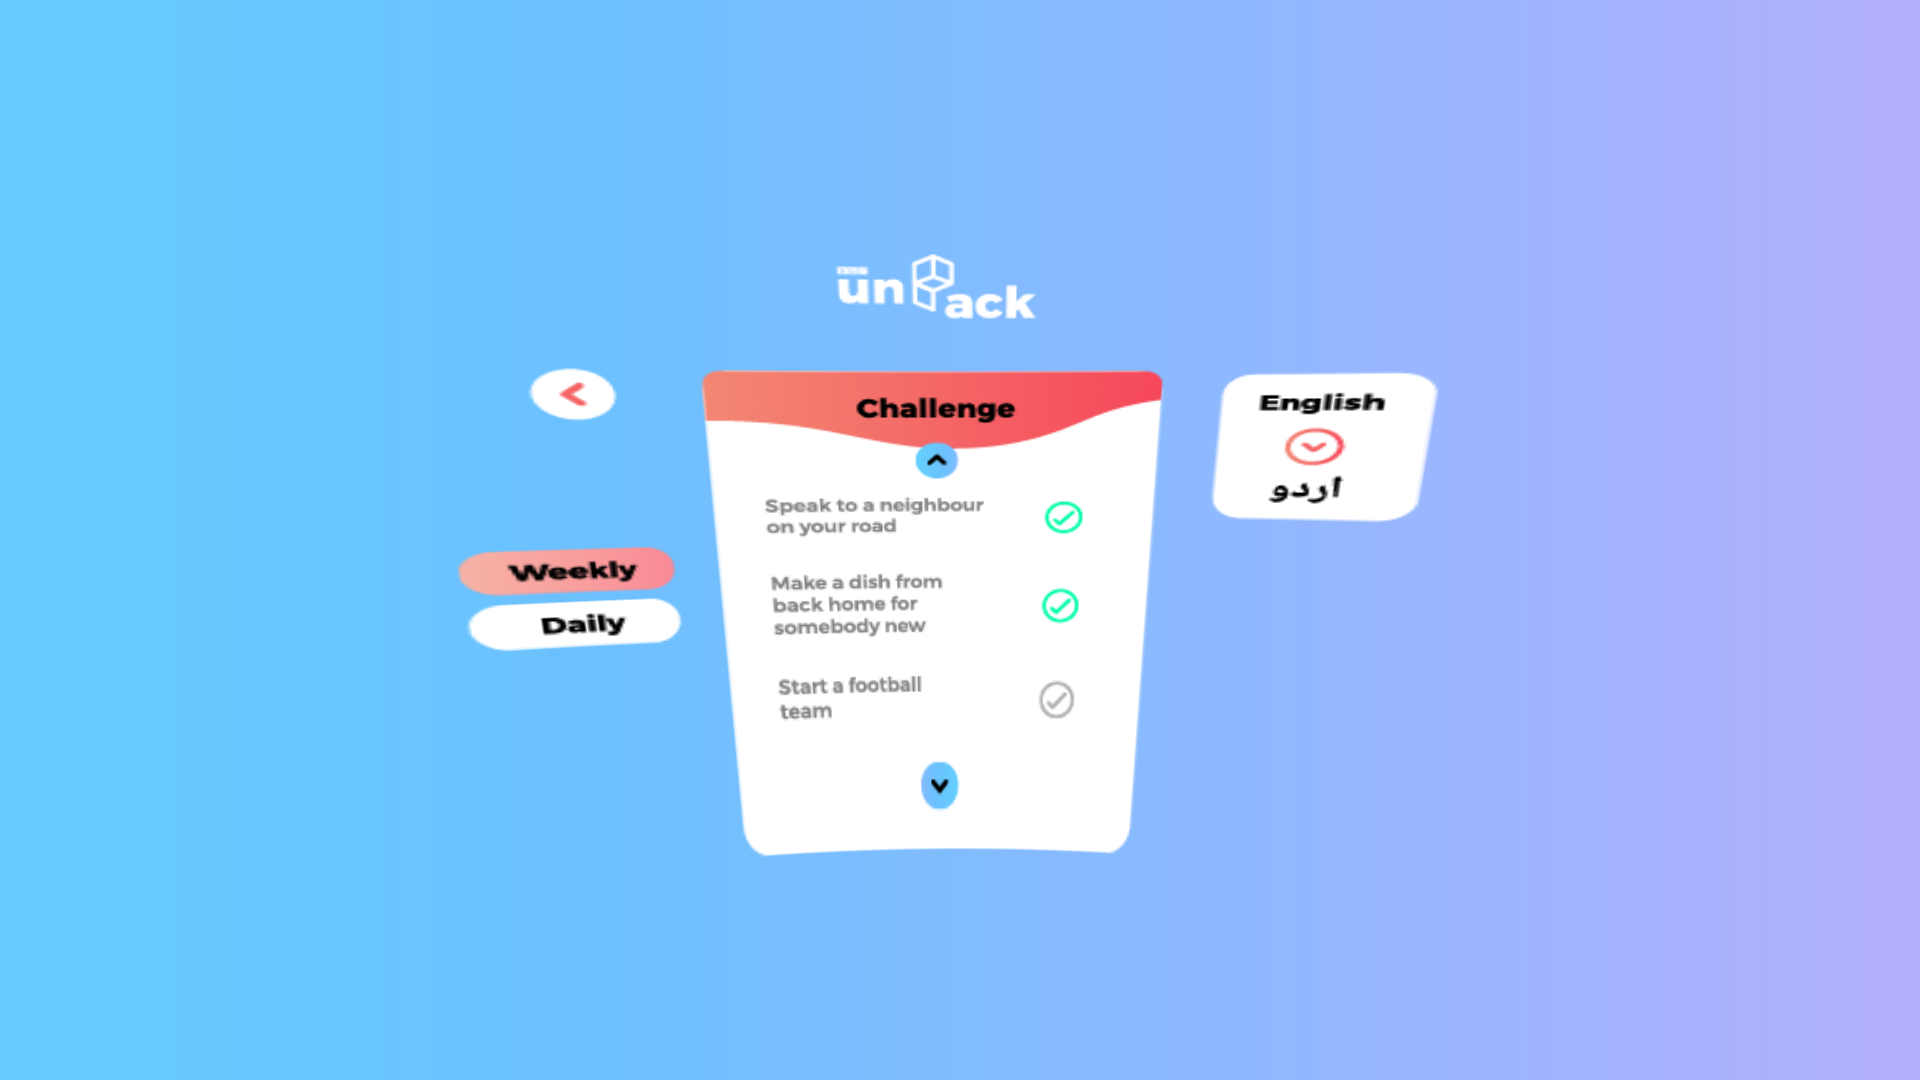 Challenge (0-00-36-13).png